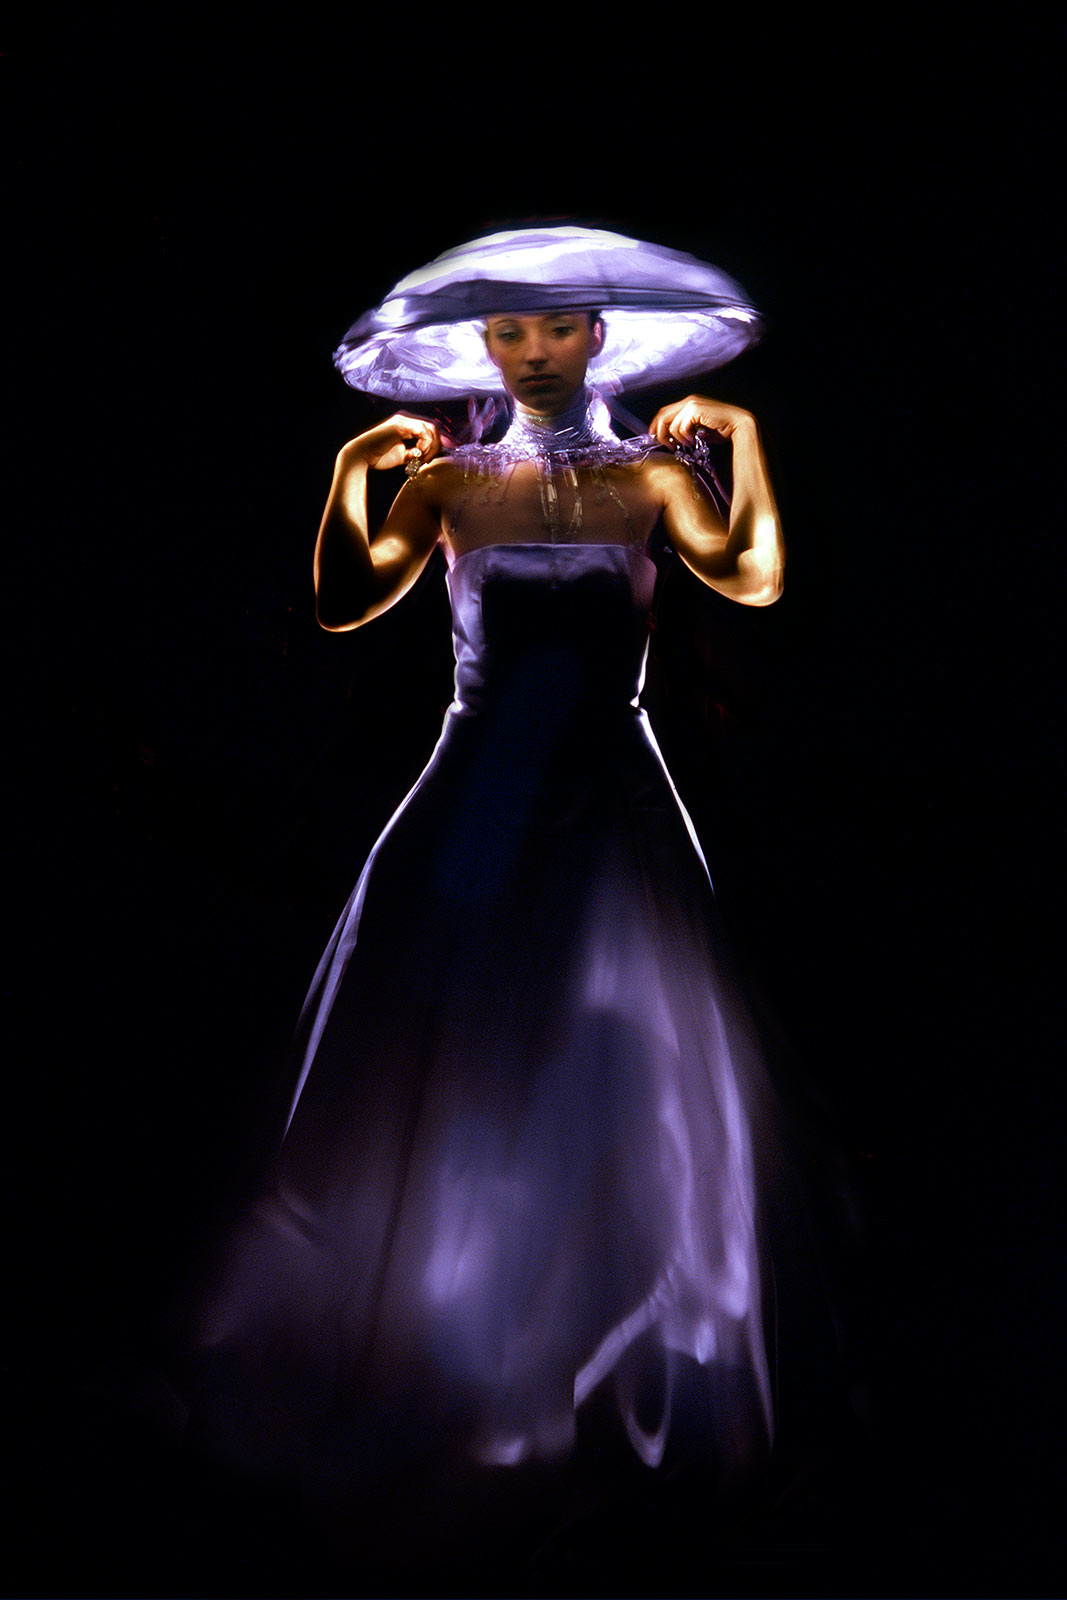 fashion_lightpainting_photography_by_Catalin_Anastase11.jpg